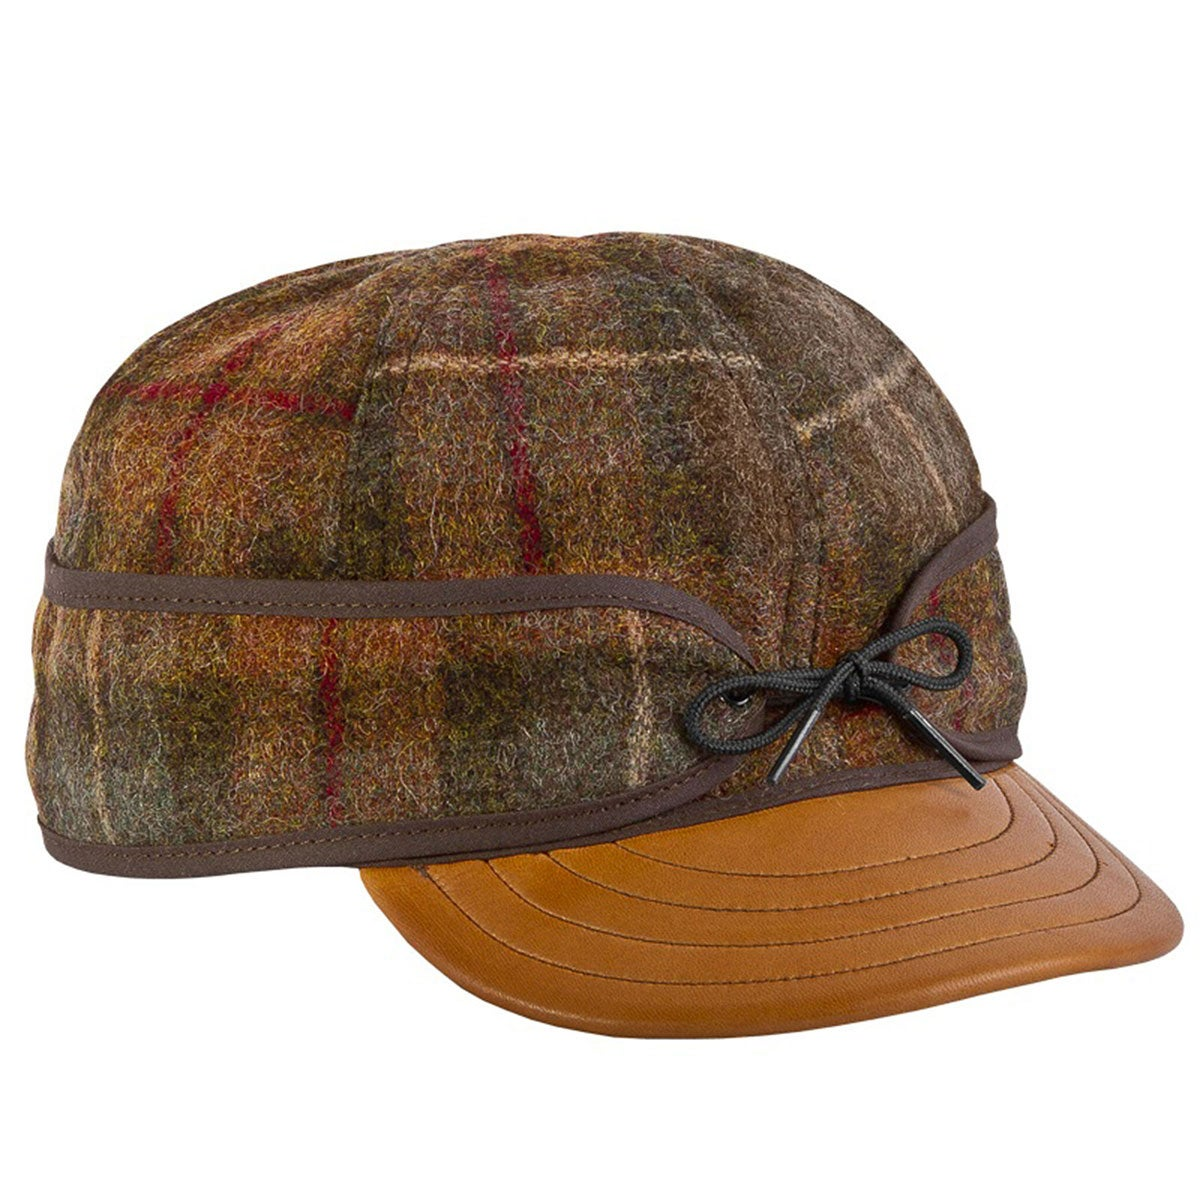 Original Stormy Kromer Cap with Deerskin Brim $49.99 AT vintagedancer.com